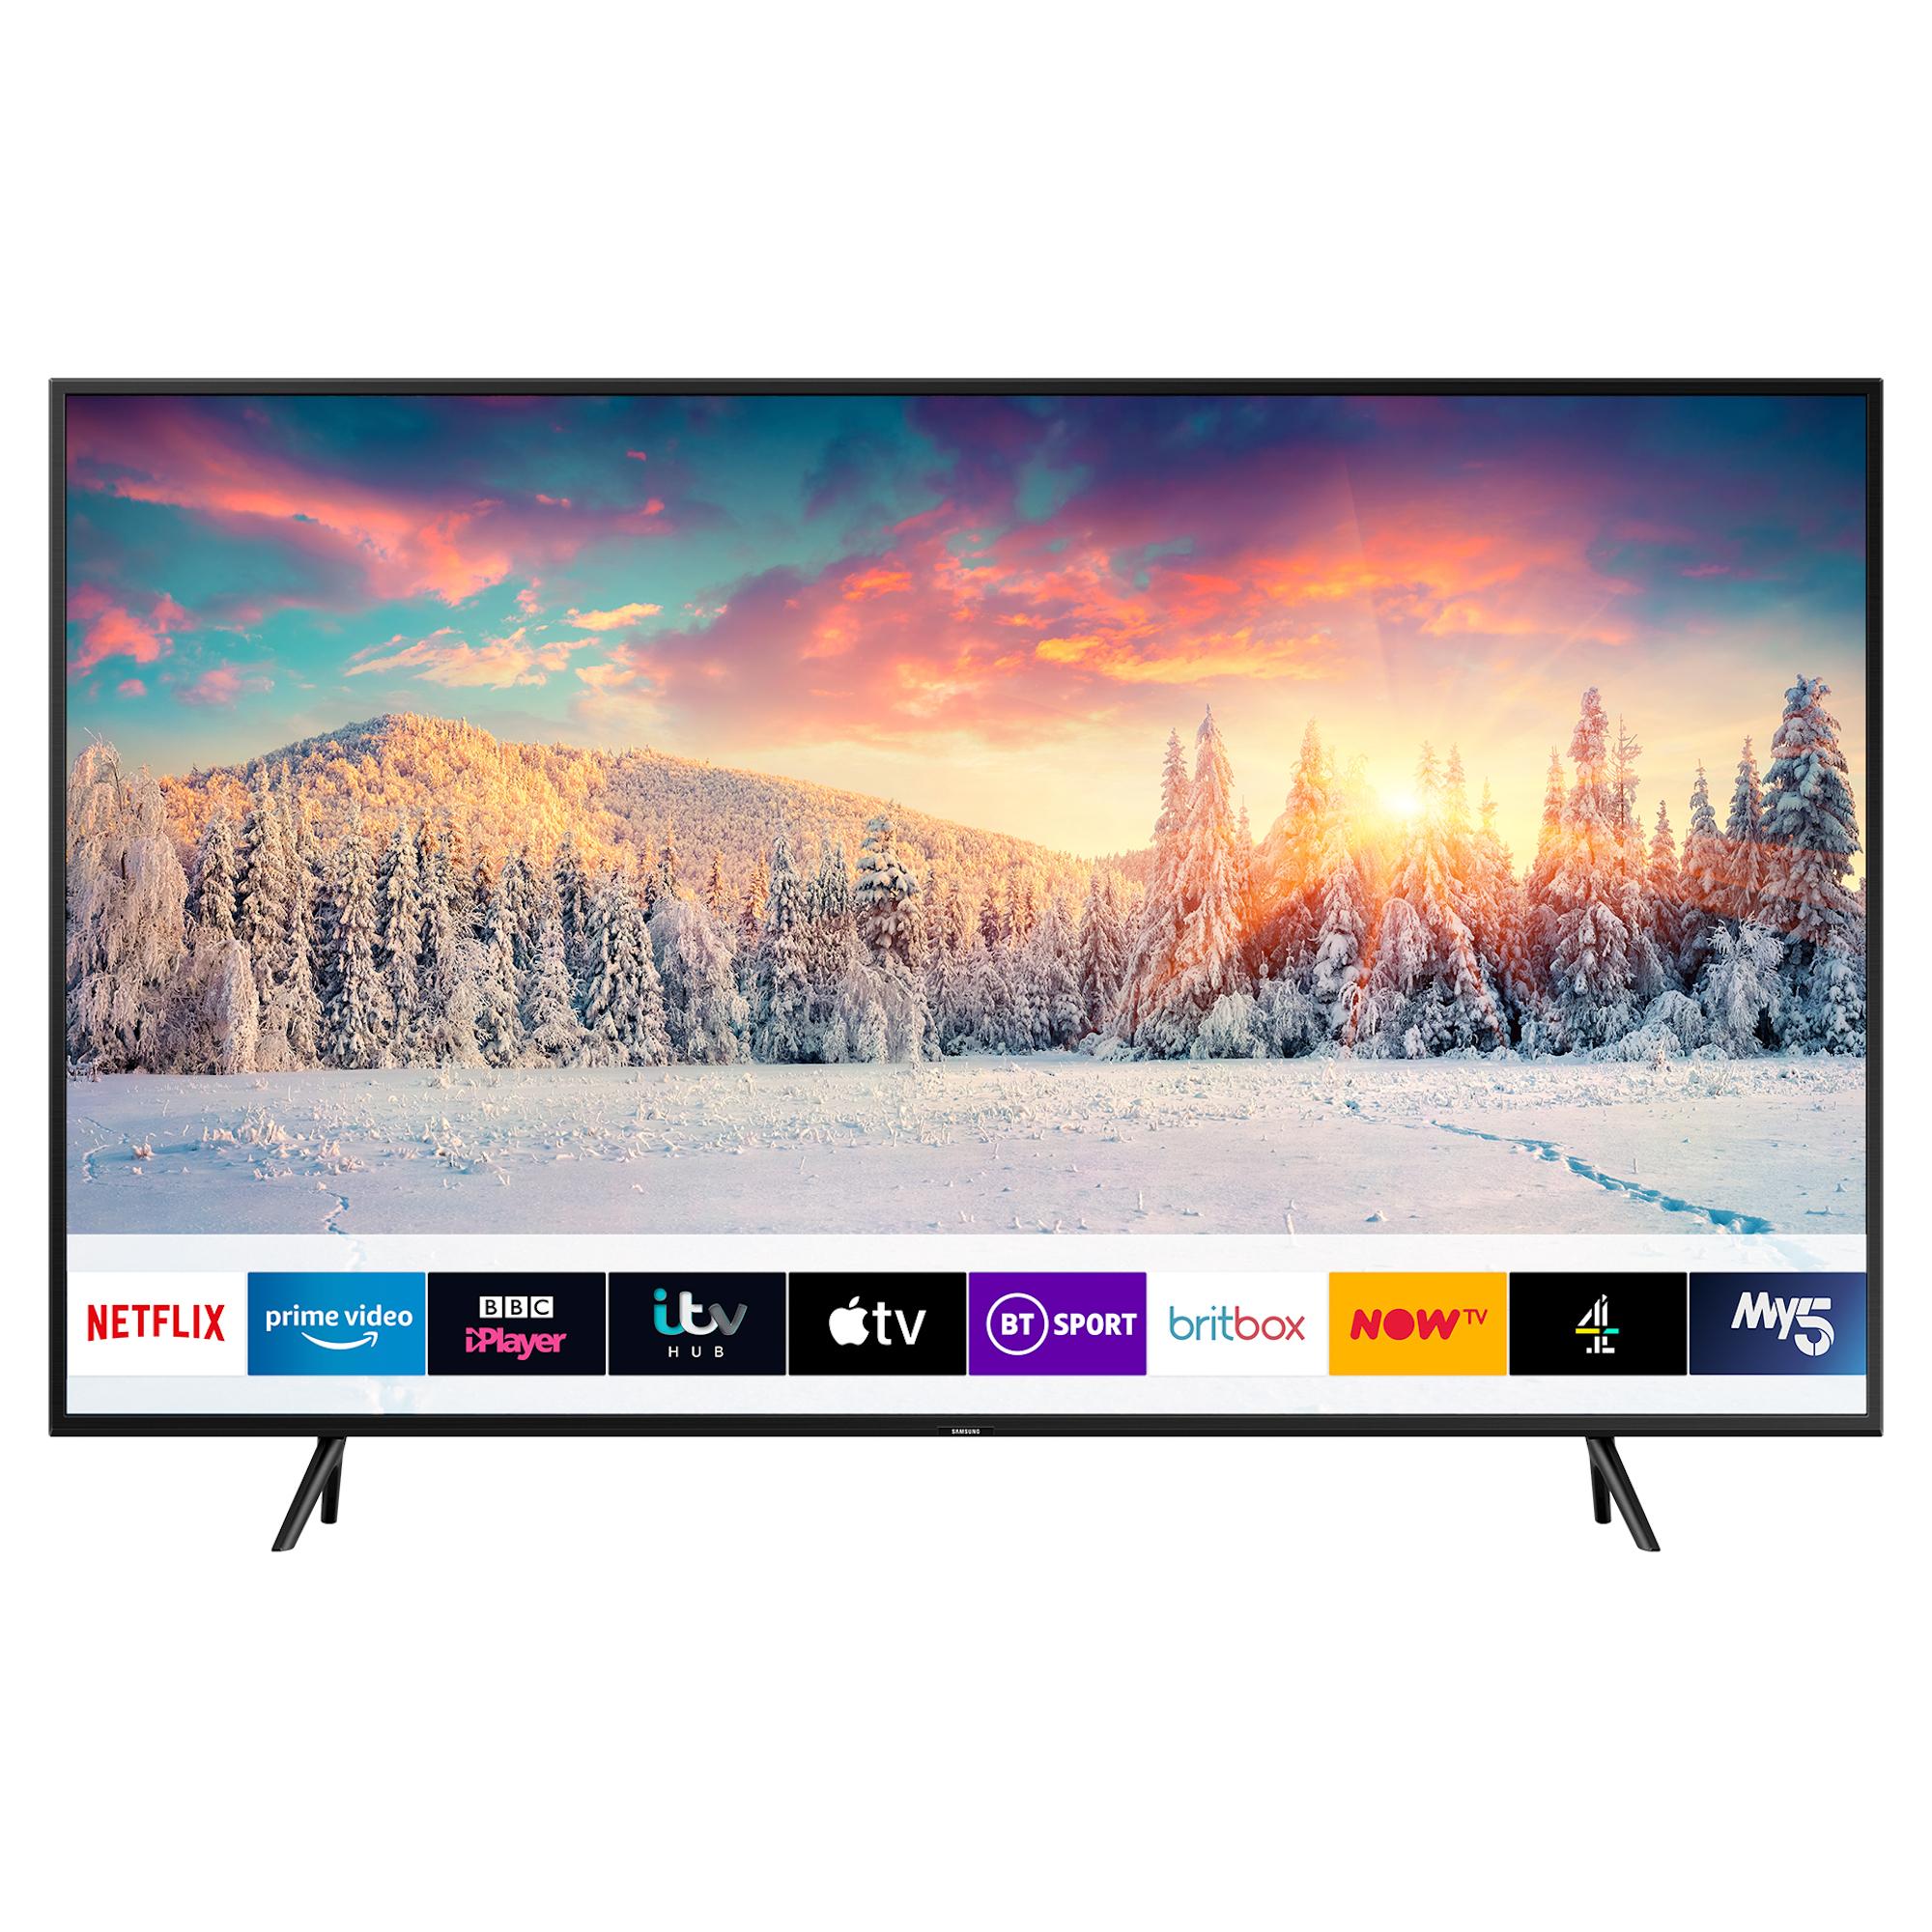 "Samsung QE55Q60R (2019) QLED HDR 4K Ultra HD Smart TV, 55"" TVPlus/Freesat HD & Apple TV App, Charcoal Black 5 Year Guarantee £659 Hughes"